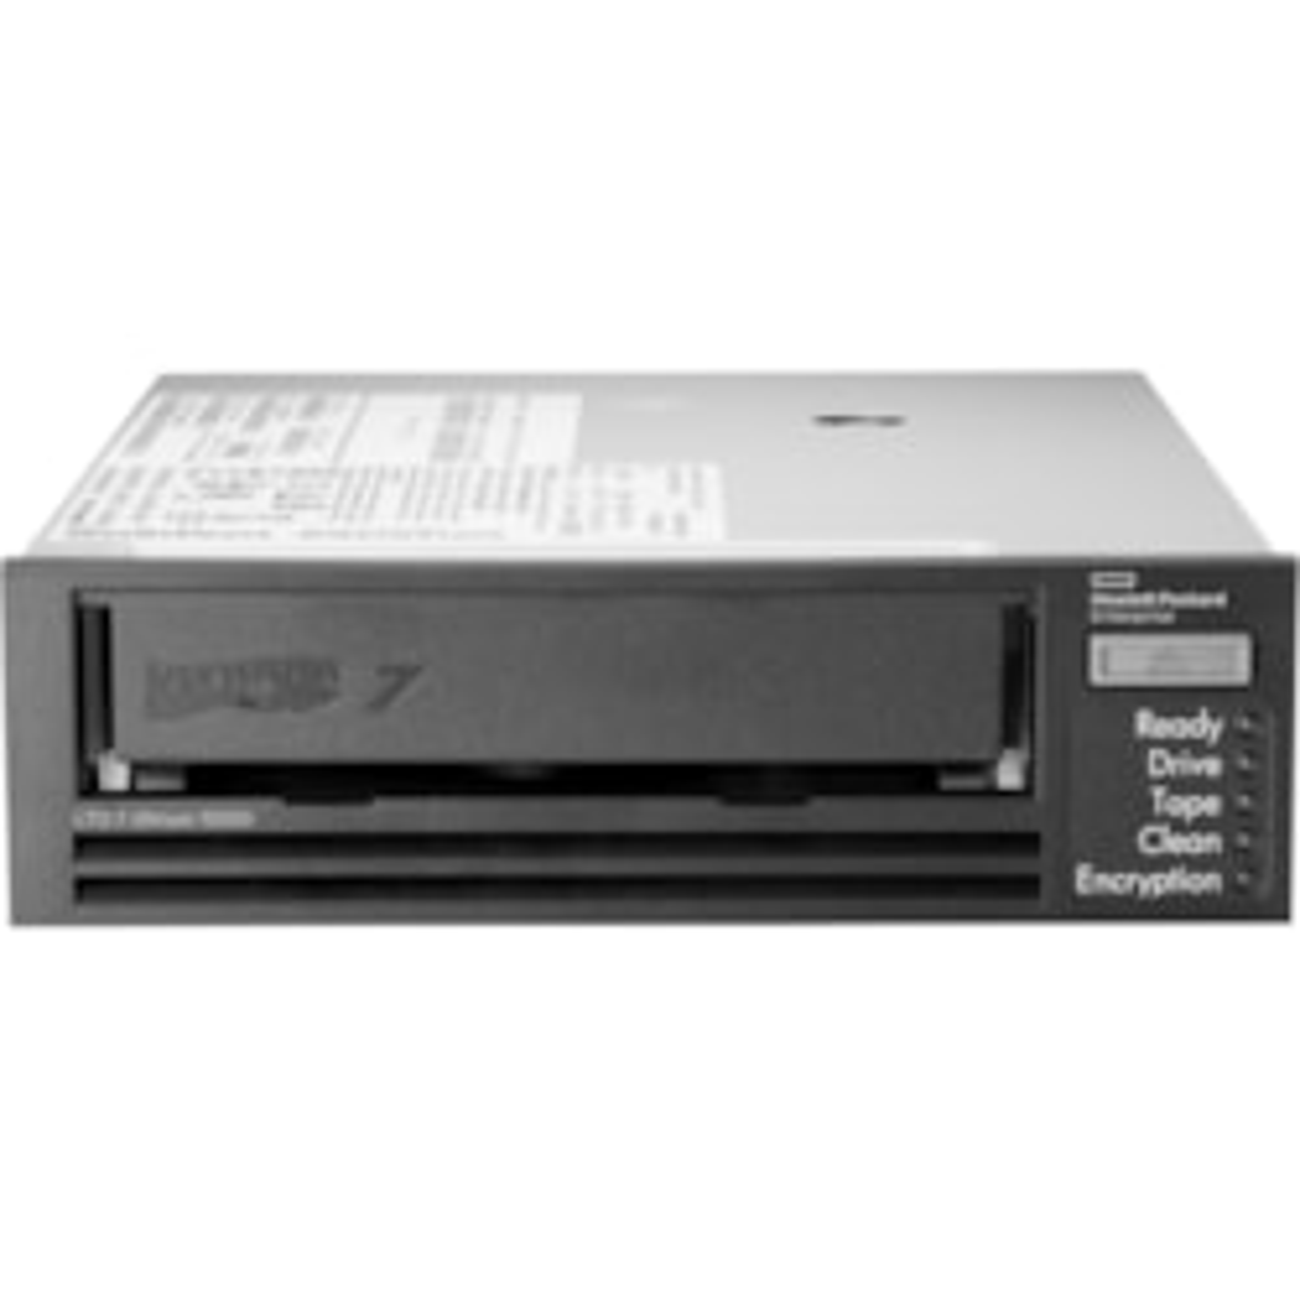 HPE StoreEver 15000 LTO-7 Tape Drive - 6 TB (Native)/15 TB (Compressed)